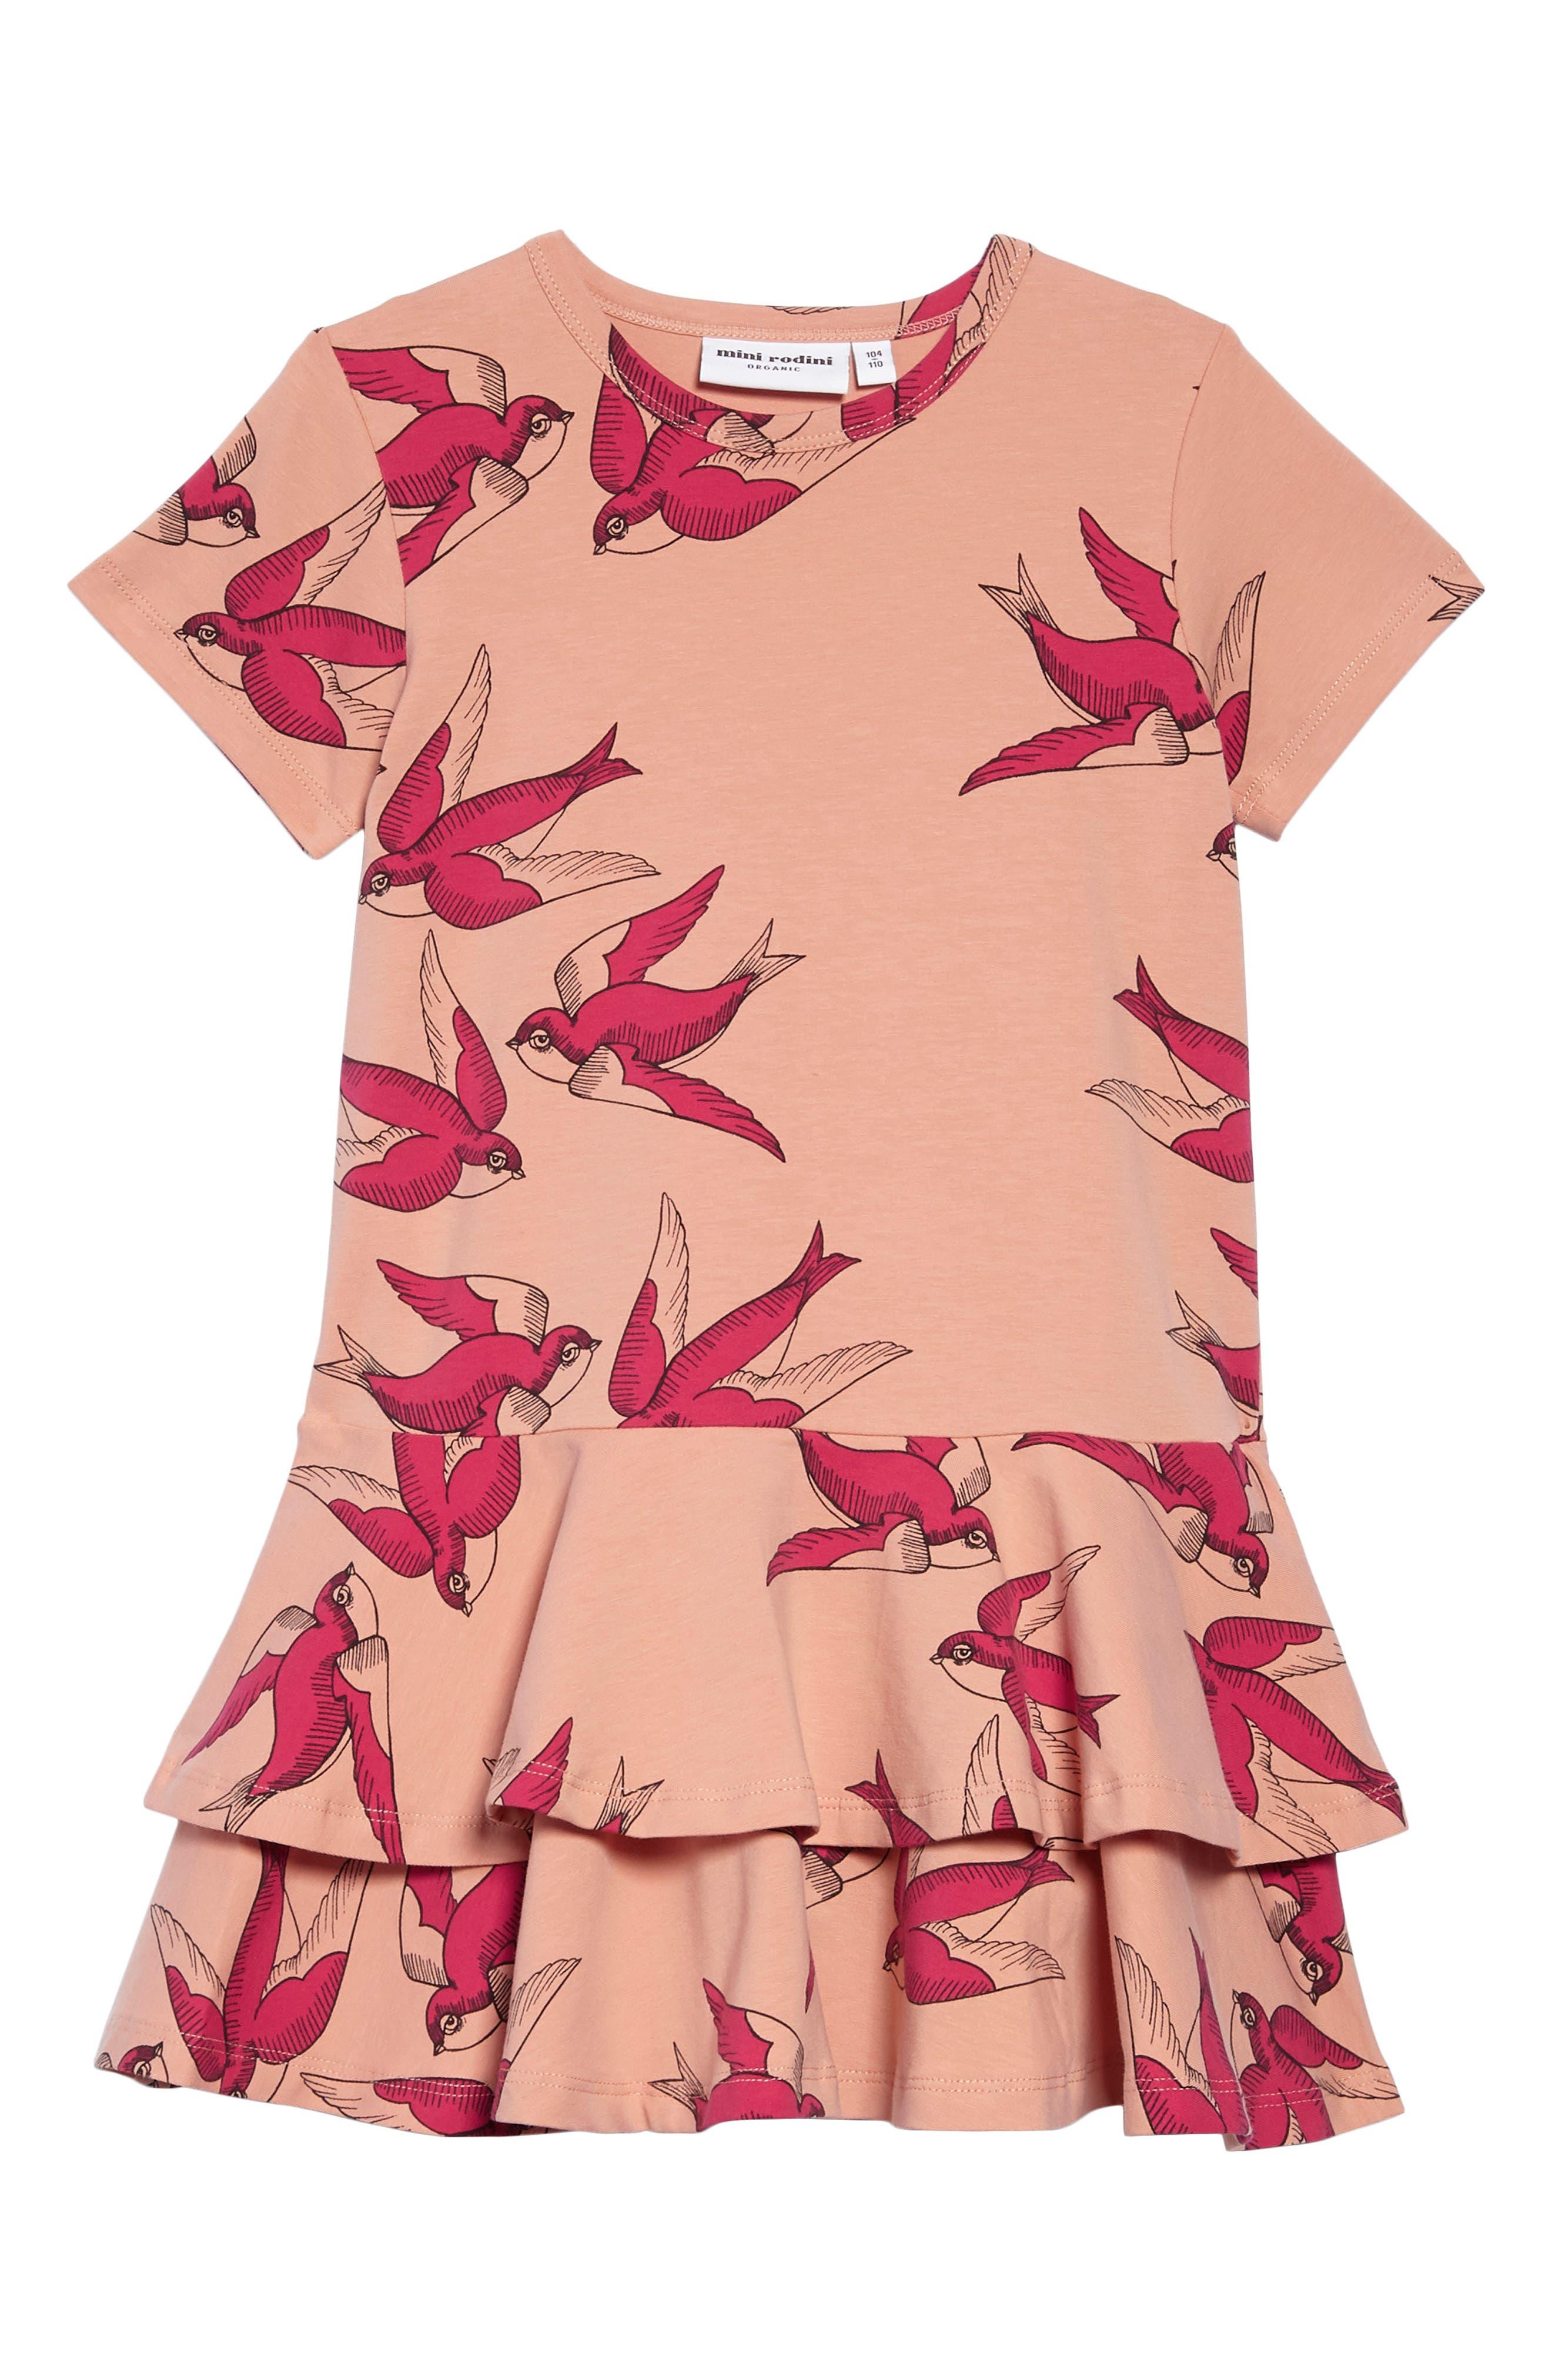 Alternate Image 1 Selected - Mini Rodini Swallows Frill Dress (Toddler Girls & Little Girls)